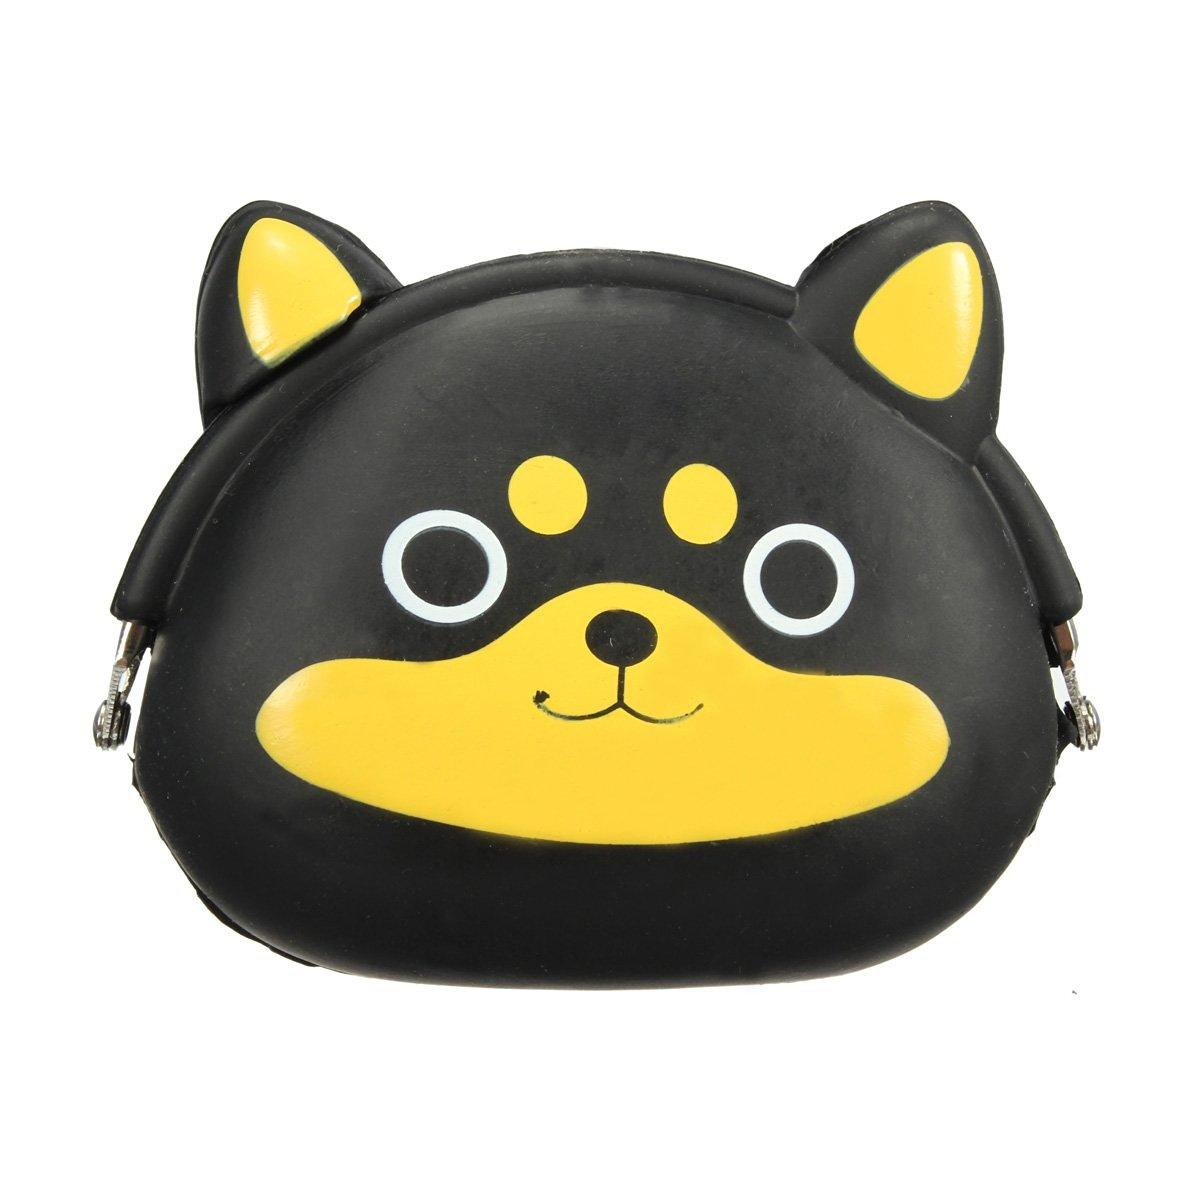 Women Girls Wallet Kawaii Cute Cartoon Animal Silicone Jelly Coin Bag Purse Kids Gift Huskies